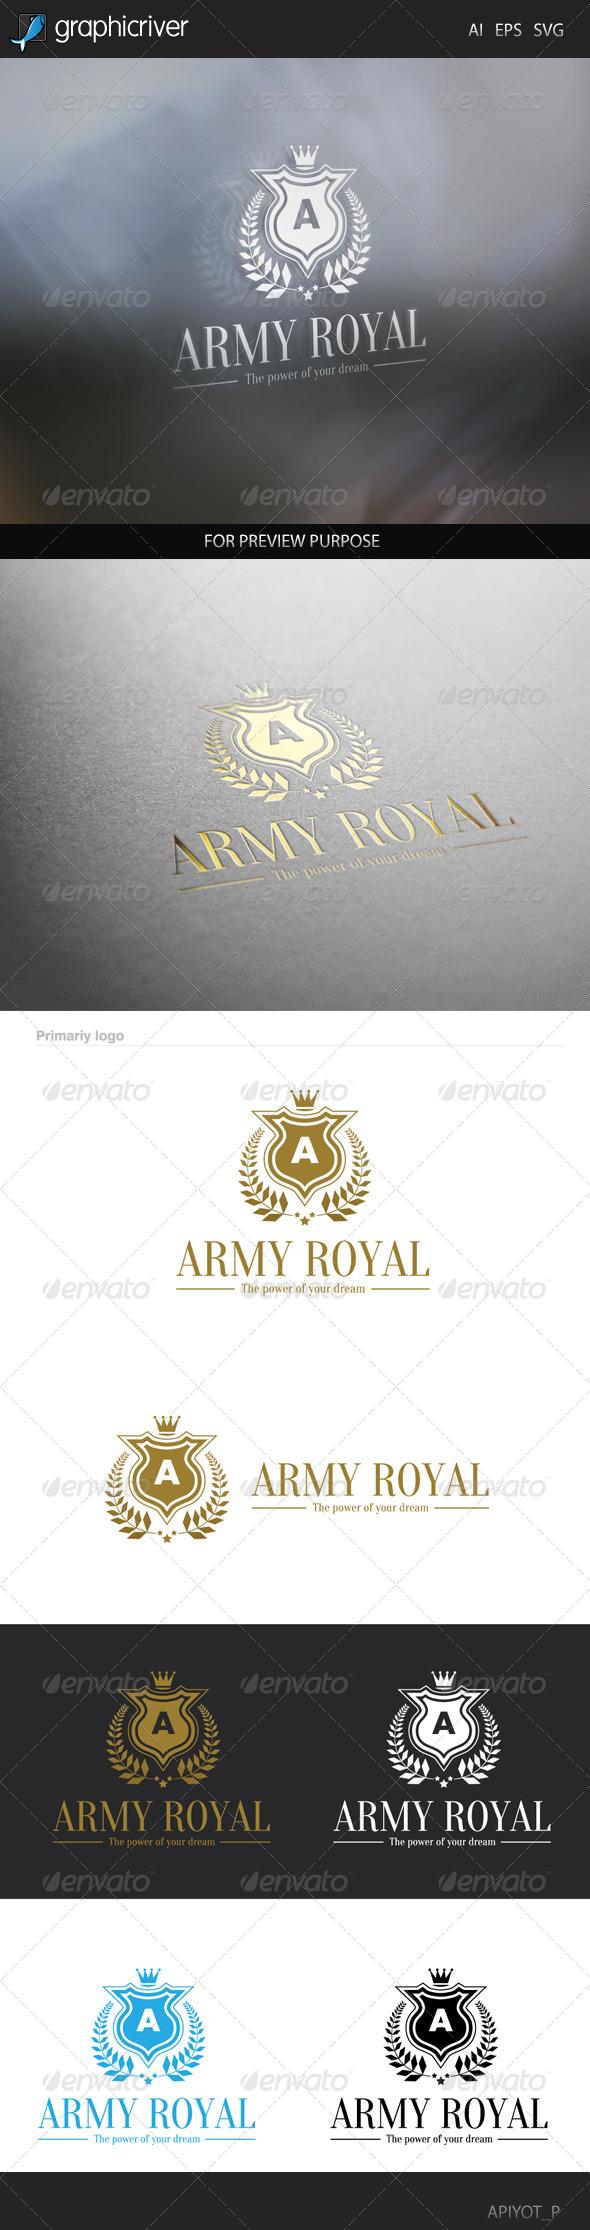 Army Royal Logo